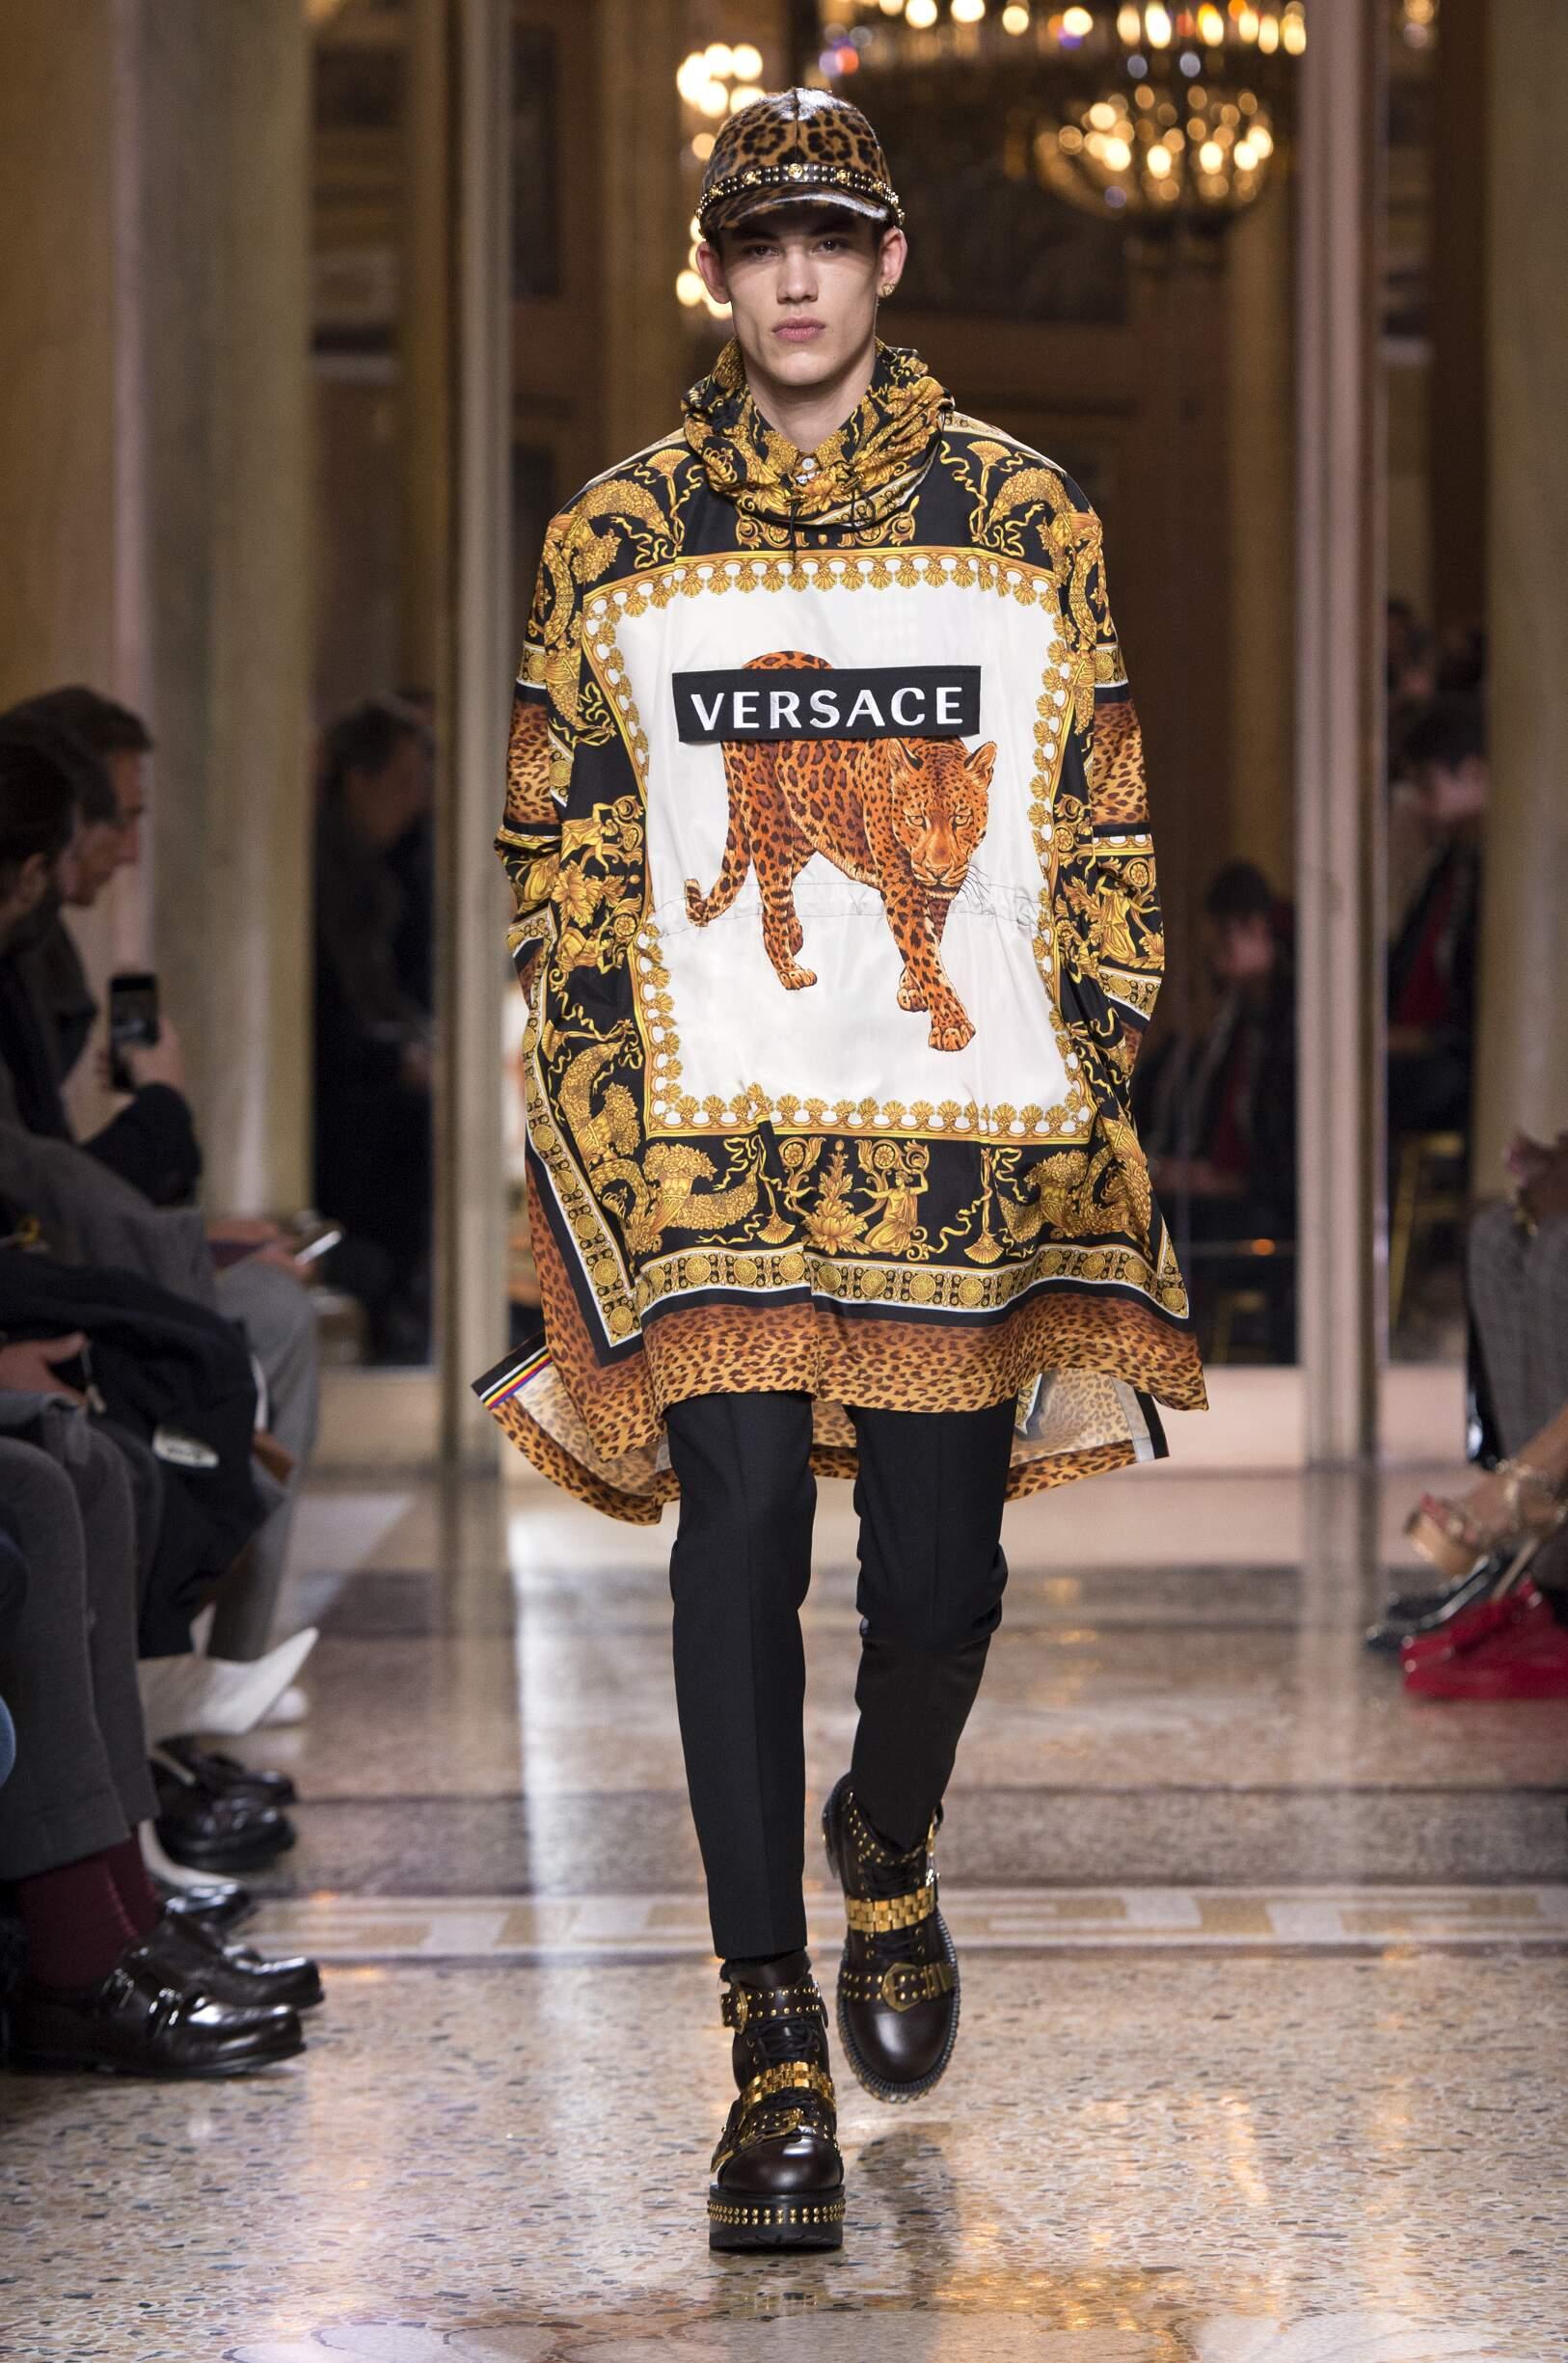 FW 2018 19 Versace Fashion Show